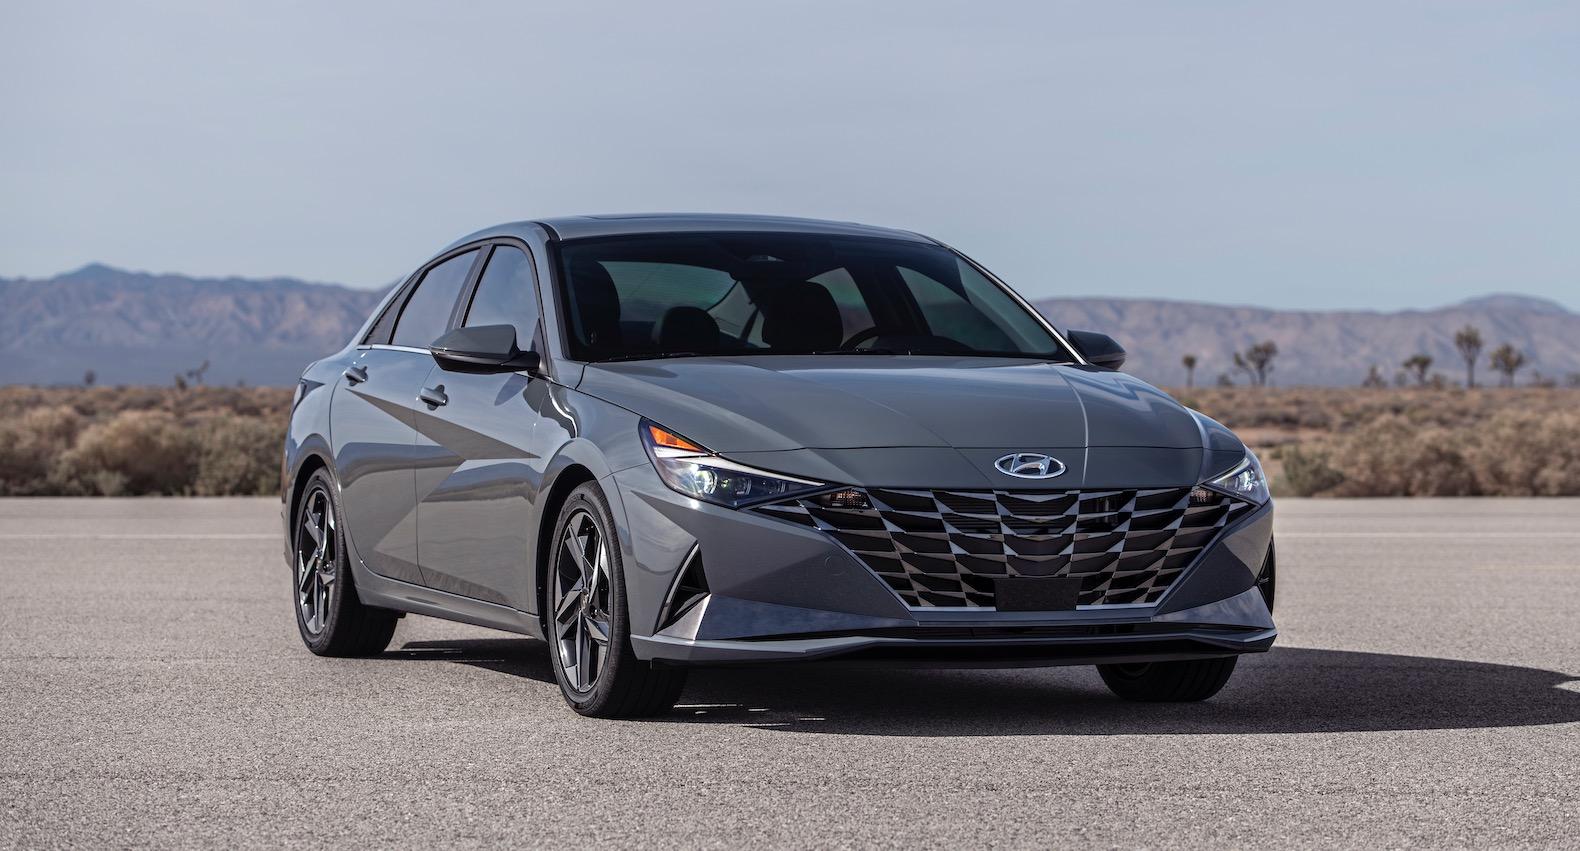 2021 Hyundai Elantra Hybrid will get over 50 mpg | The ...